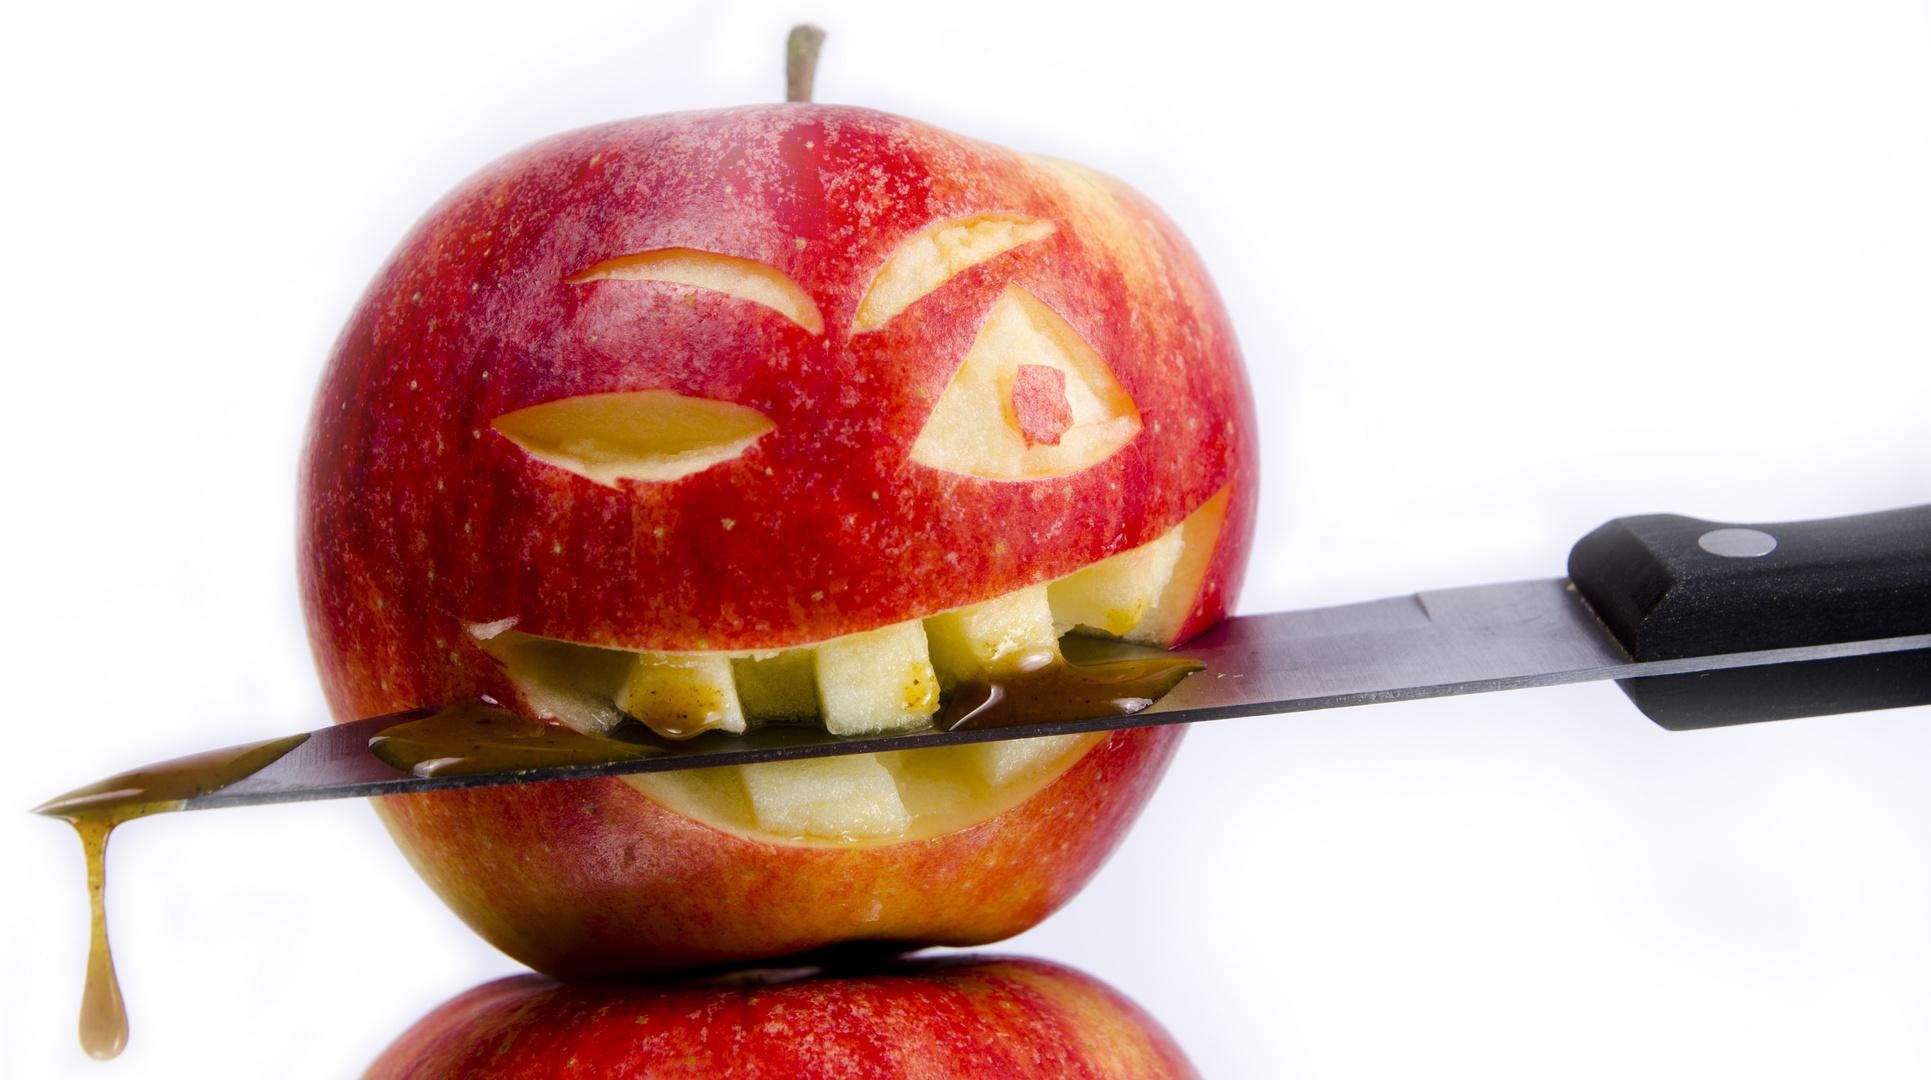 bloodthirsty apple